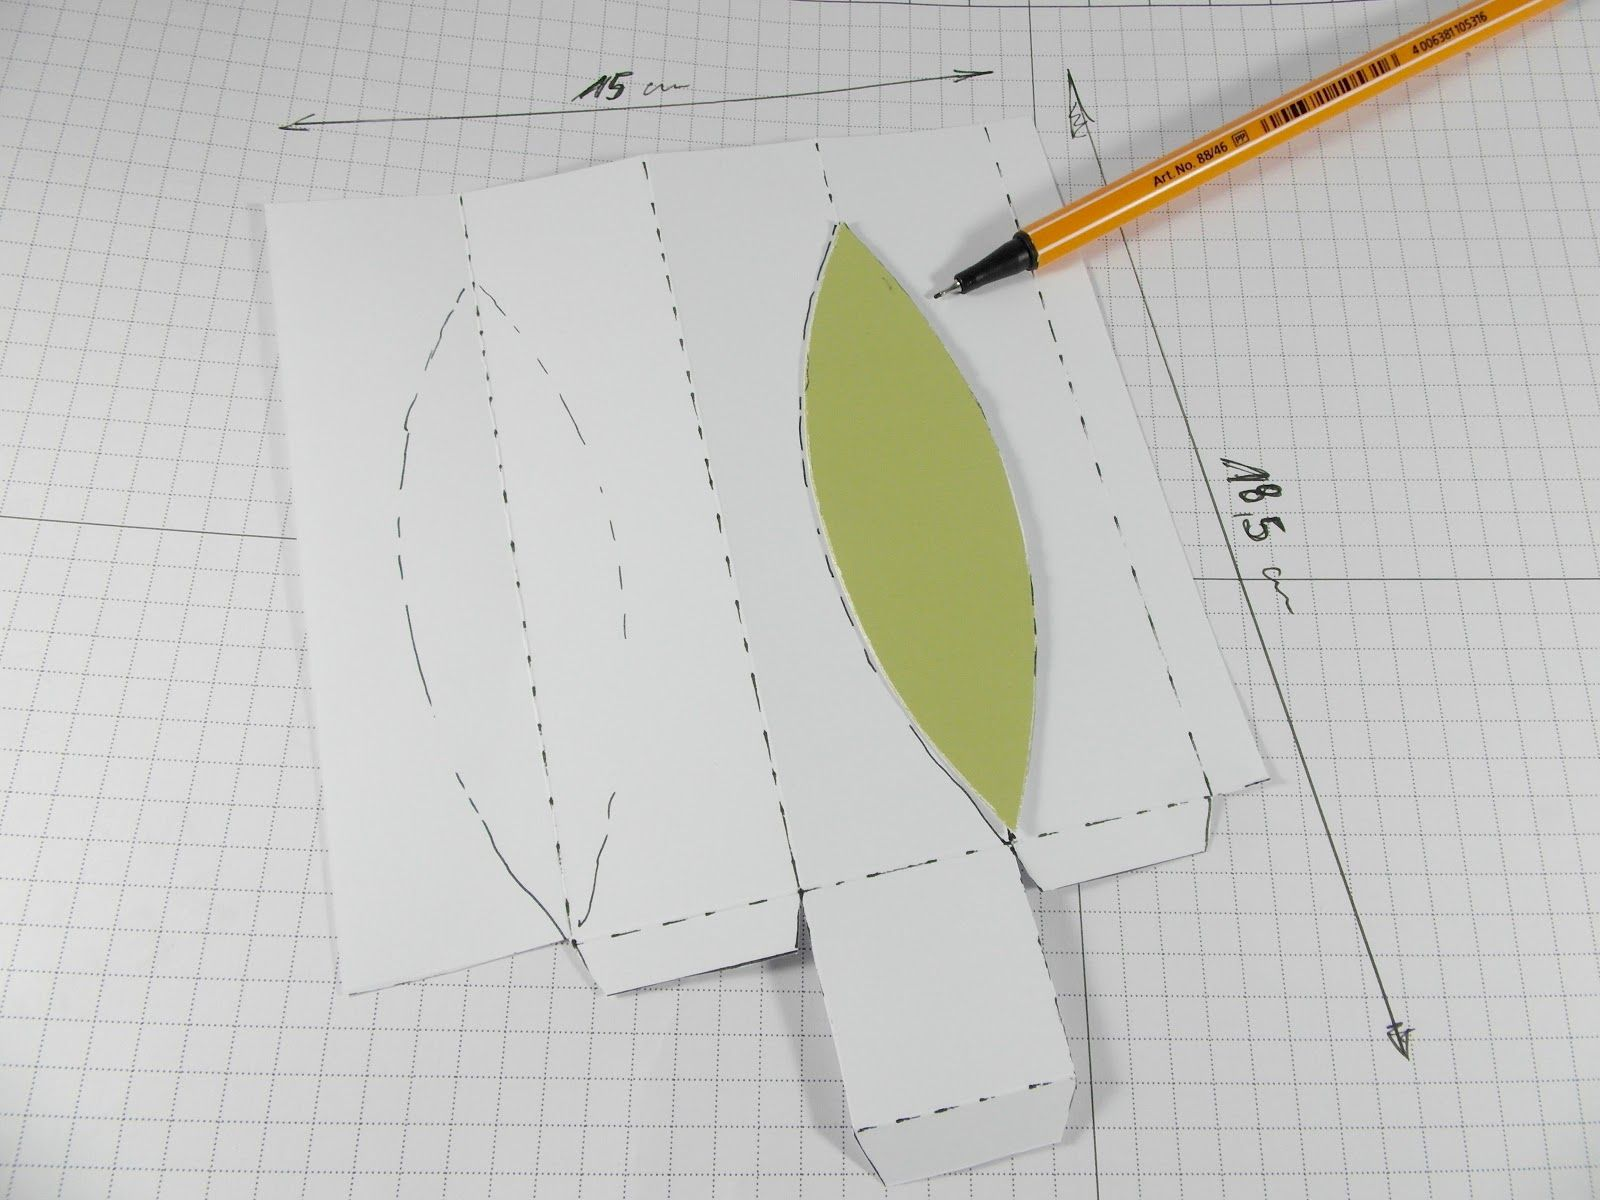 mein haus mein garten mein hobby rocher engel verpackung die anleitung verpackungen diy. Black Bedroom Furniture Sets. Home Design Ideas